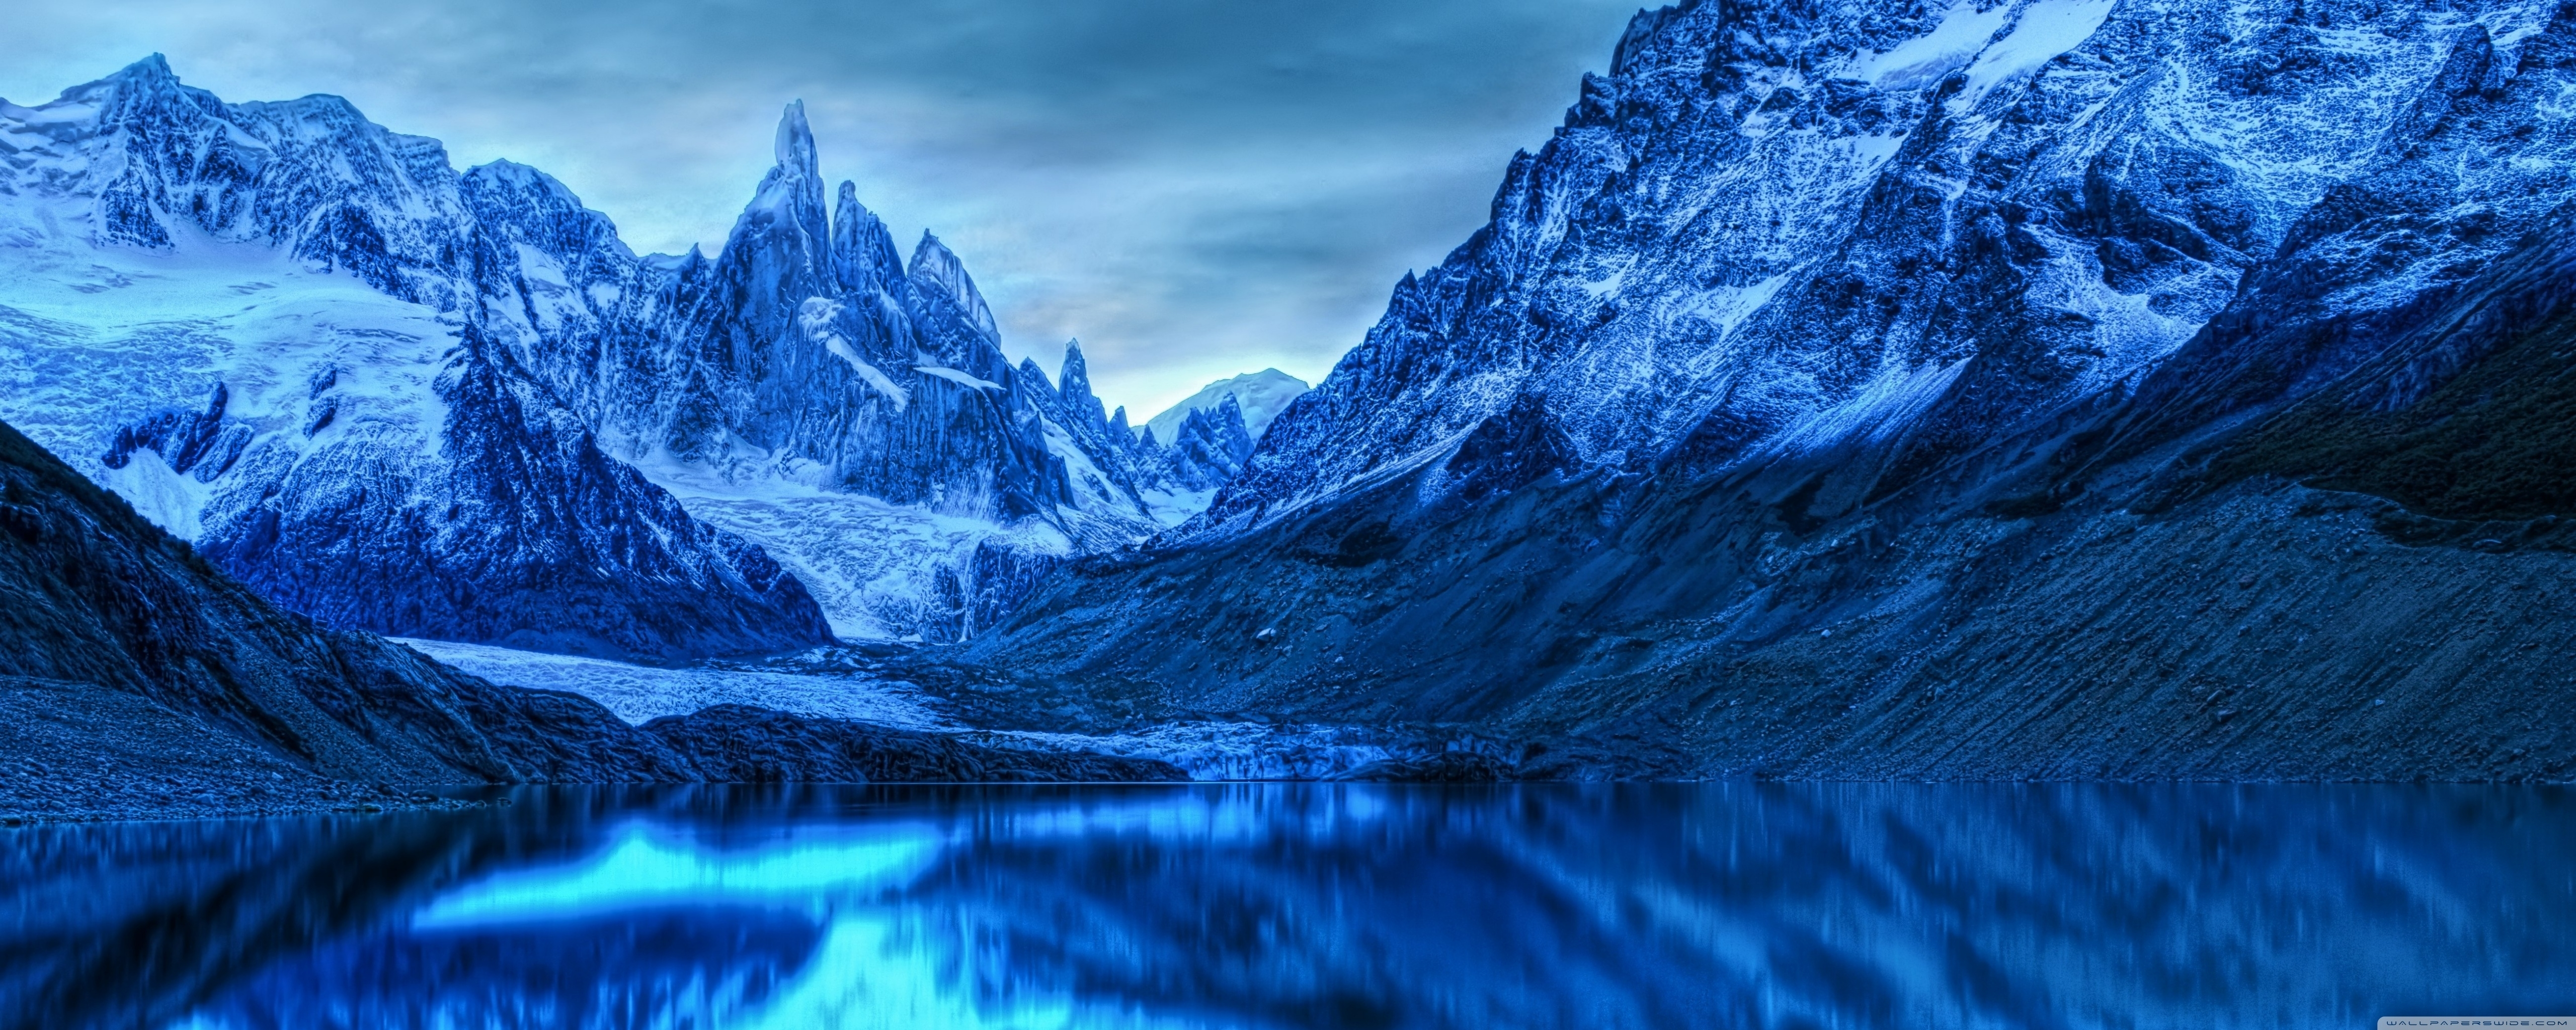 cold landscape ❤ 4k hd desktop wallpaper for 4k ultra hd tv • dual